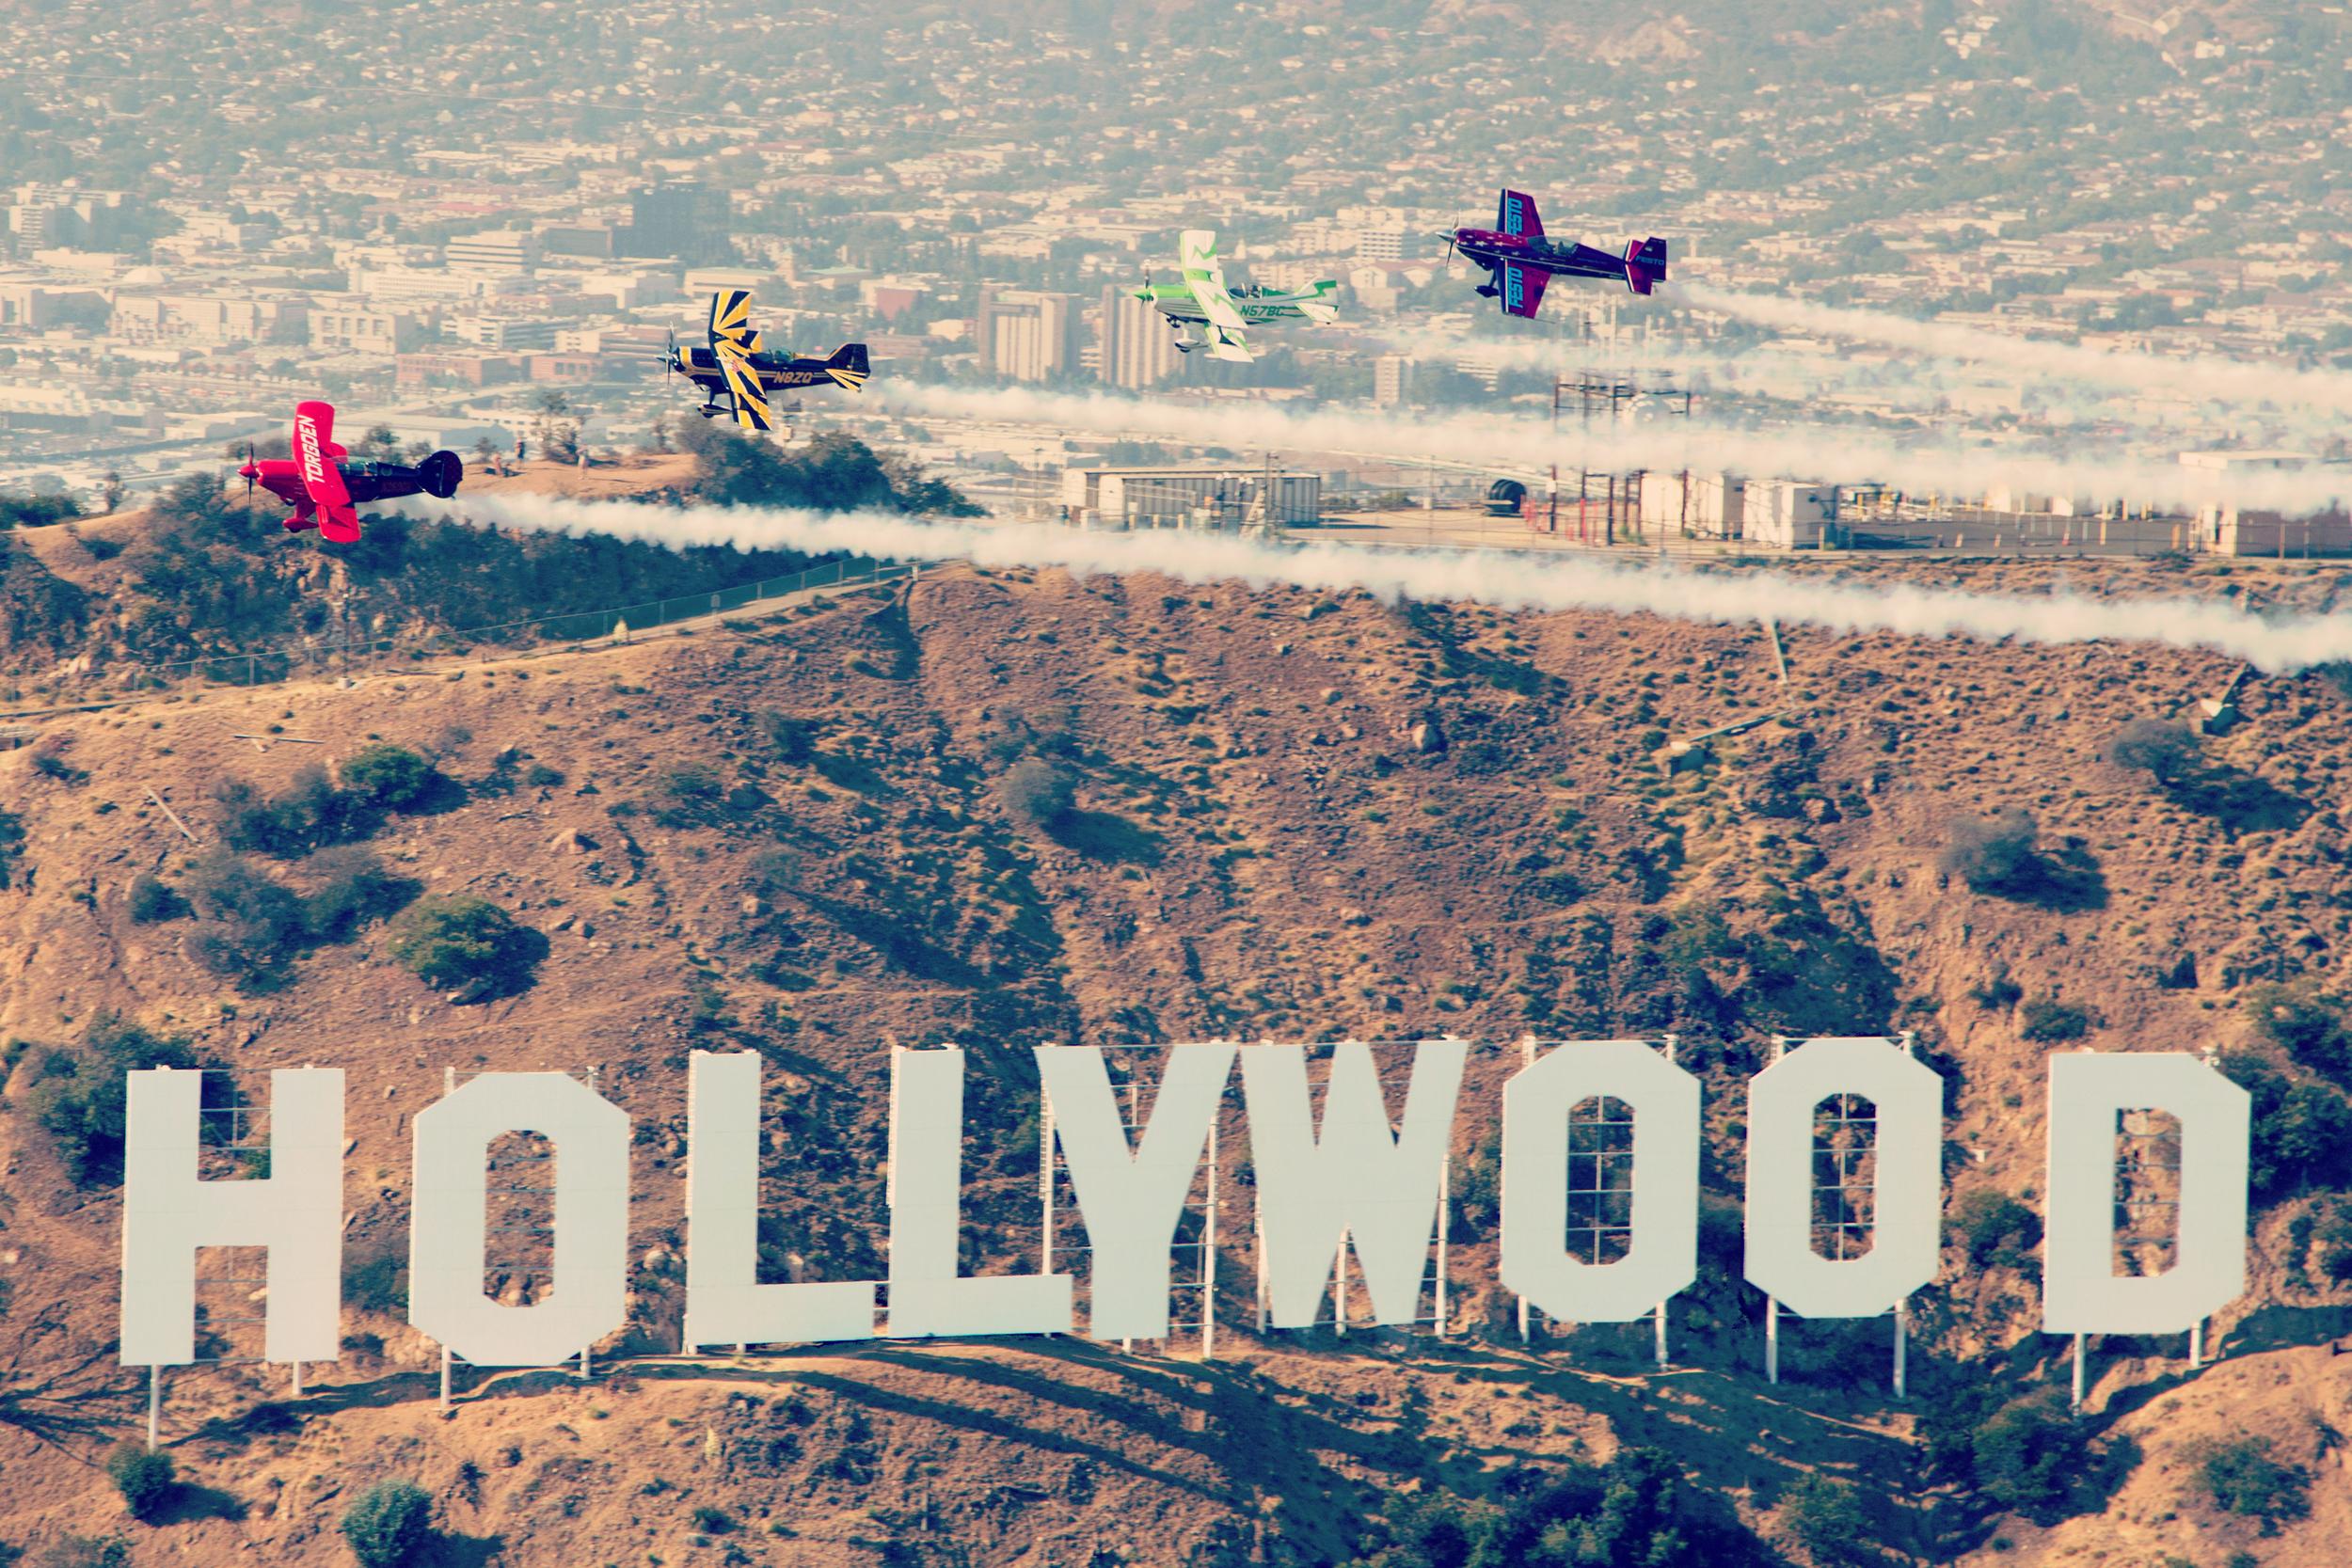 Hollywood Shoot cropped_vintage.jpg